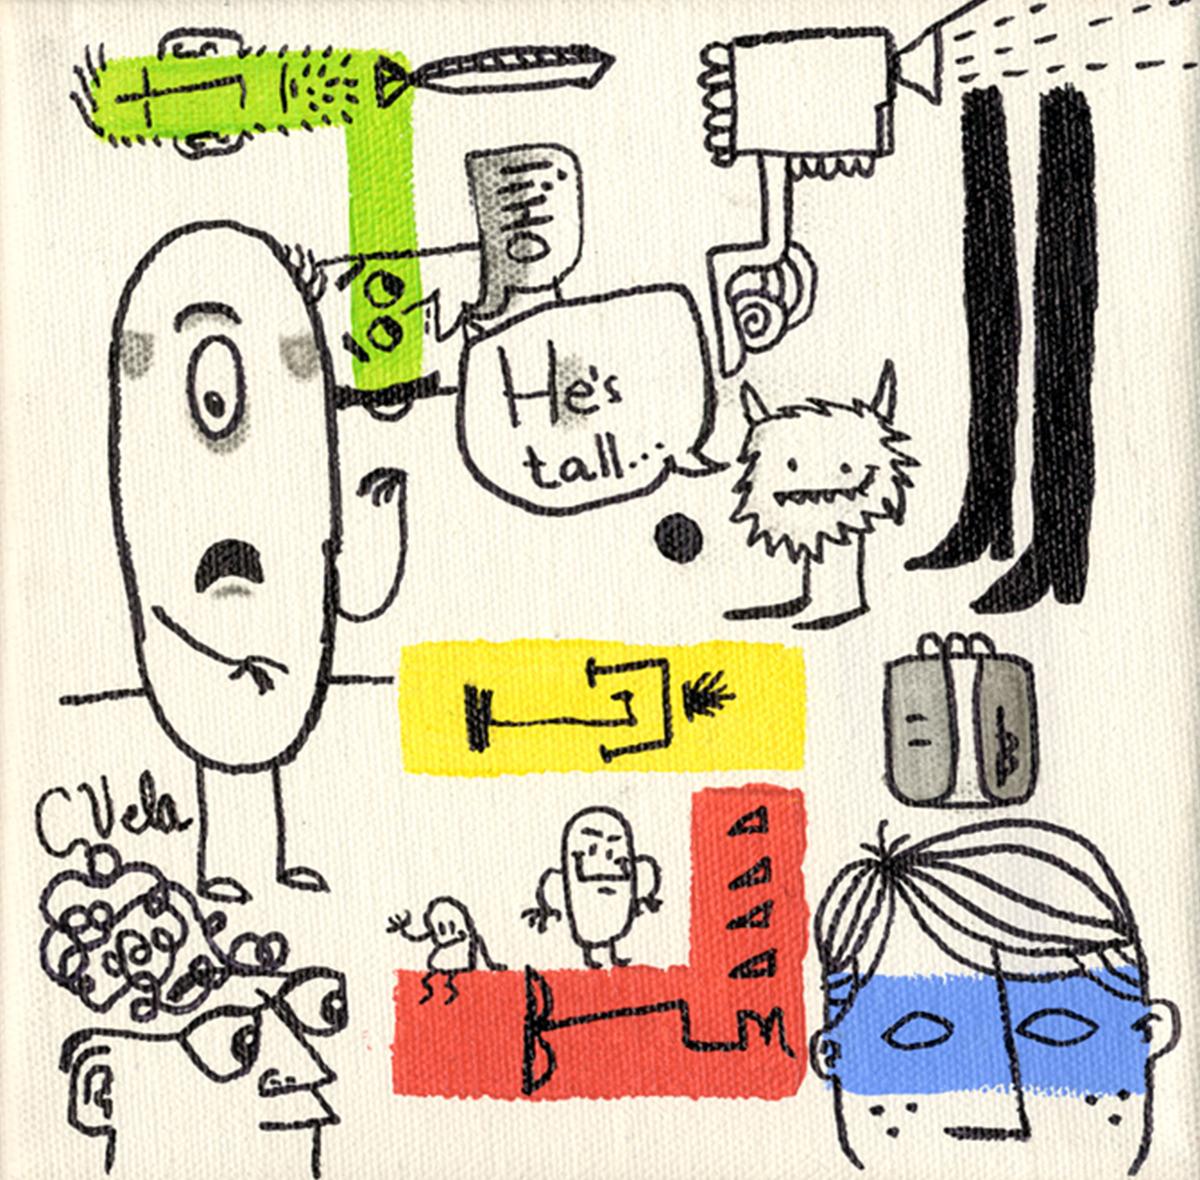 CanvasForACause_cvela_doodles.jpg